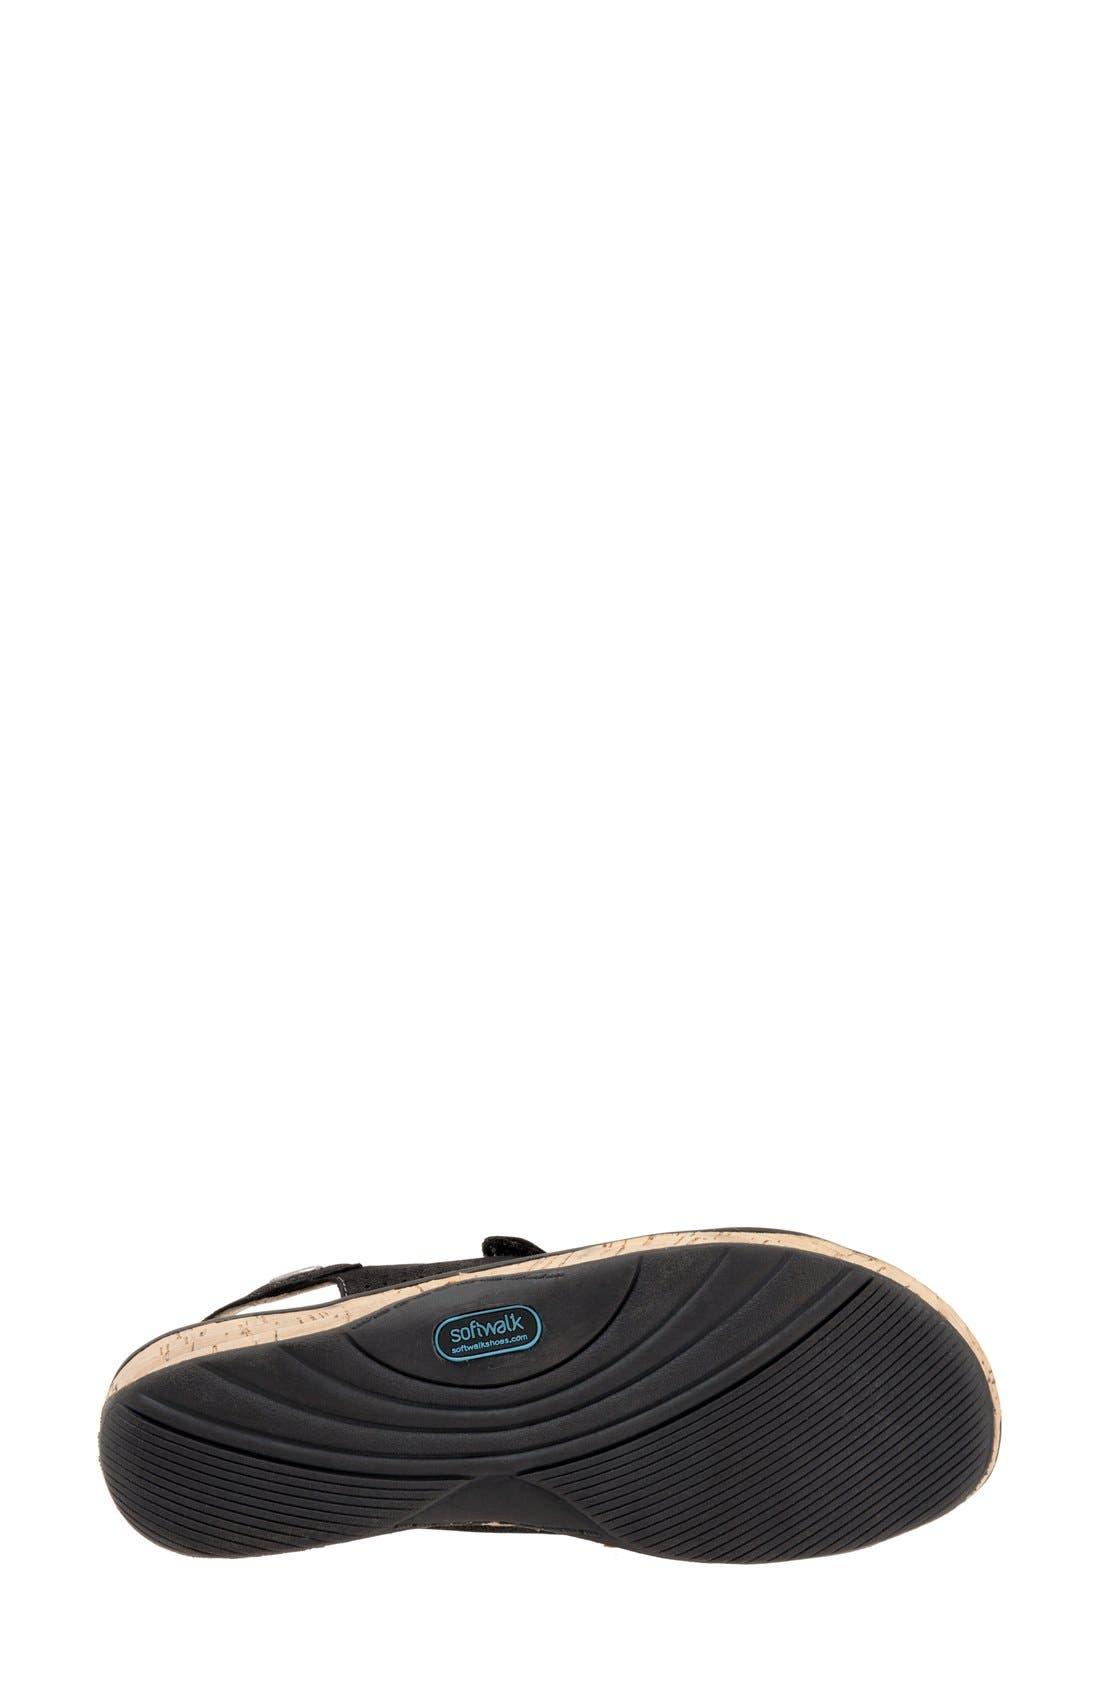 'Bolivia' Sandal,                             Alternate thumbnail 4, color,                             Black Perforated Leather